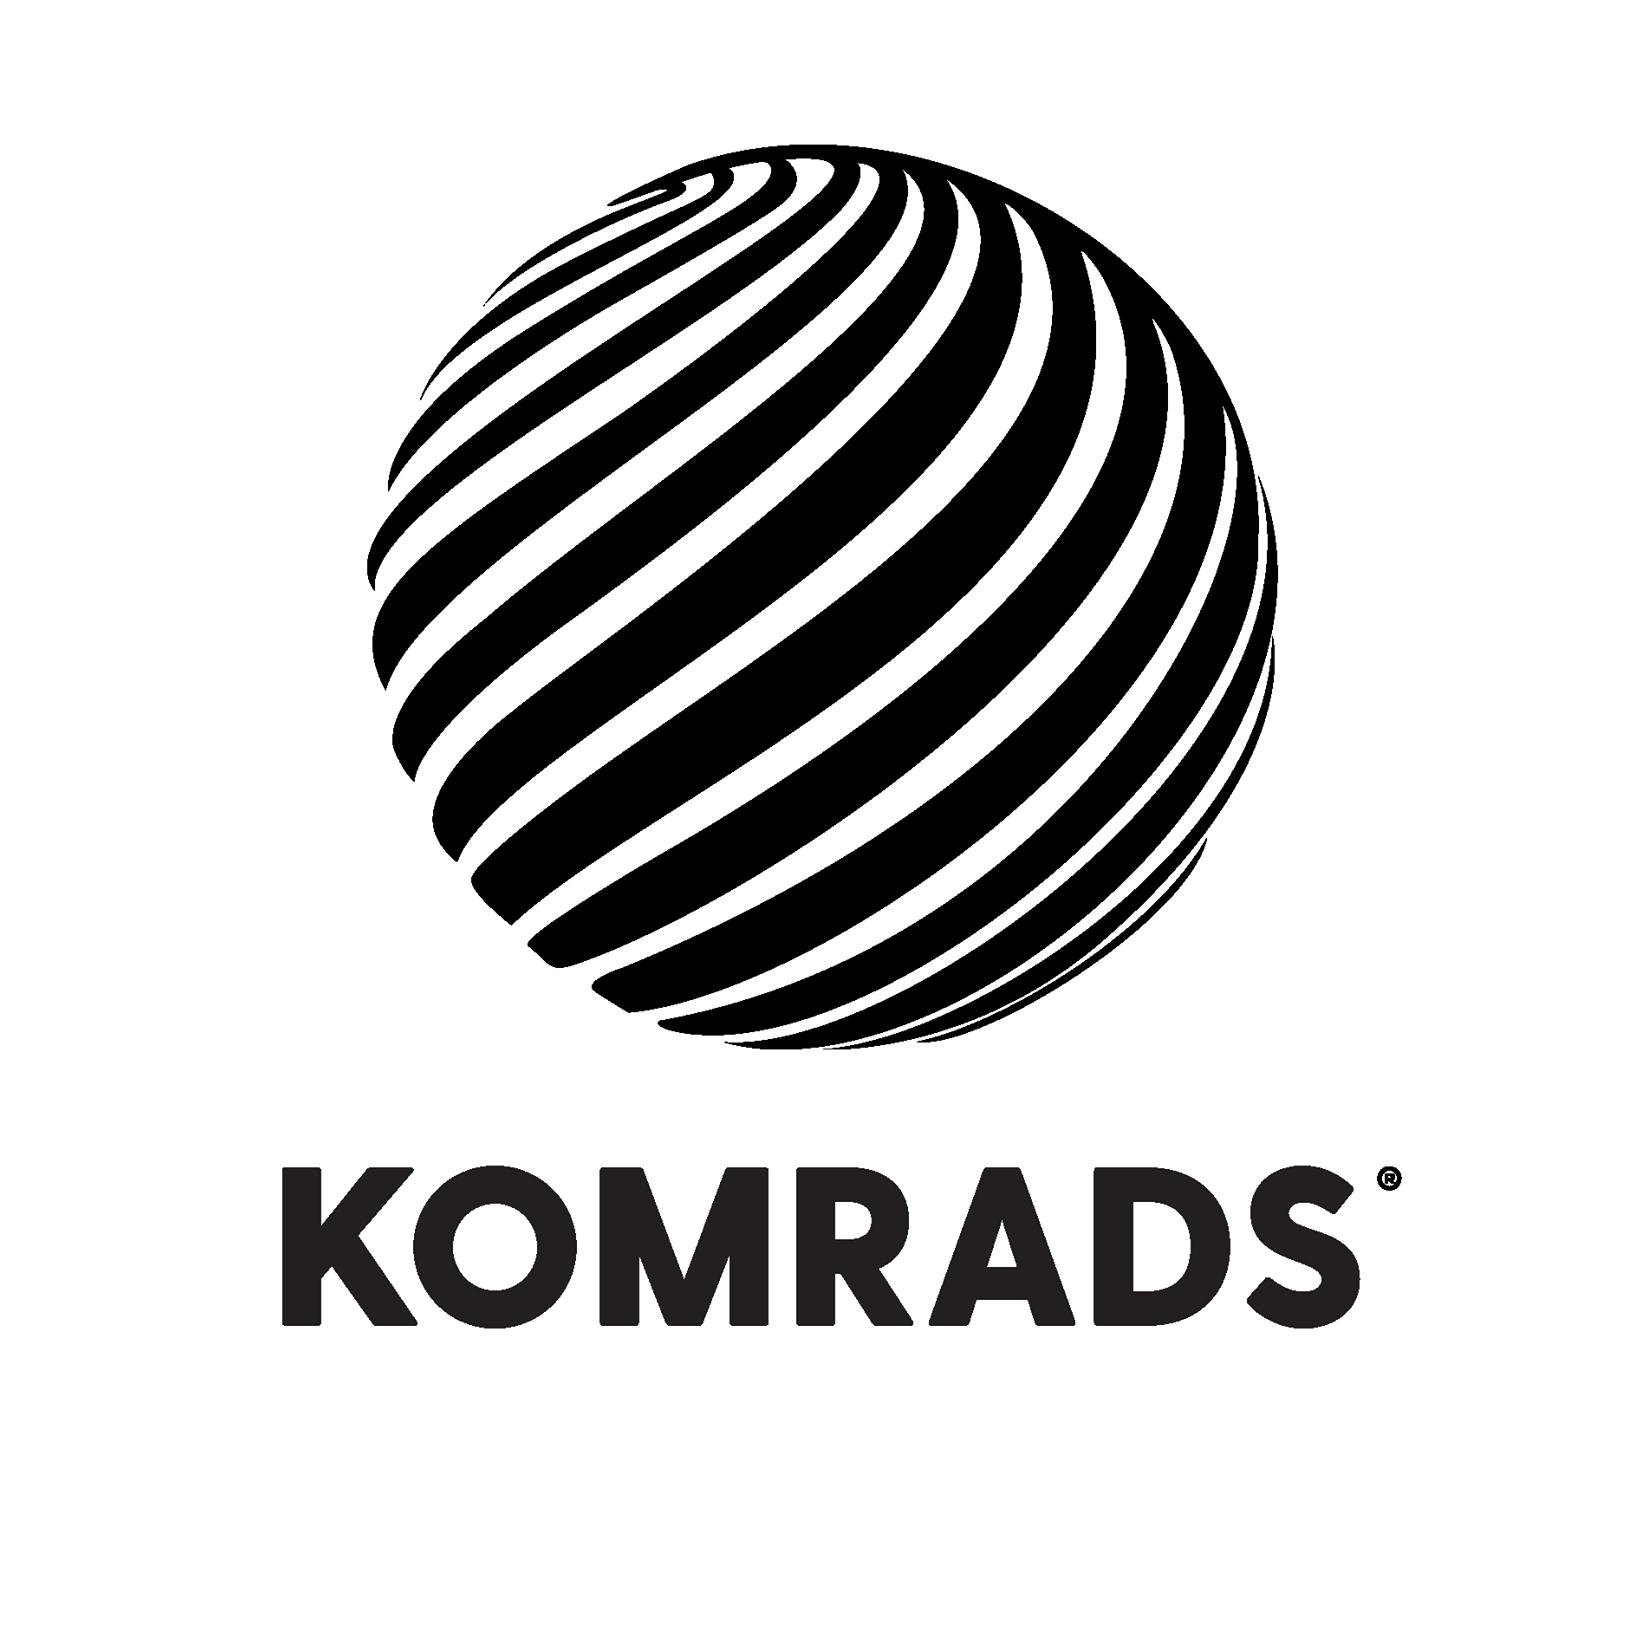 Komrads